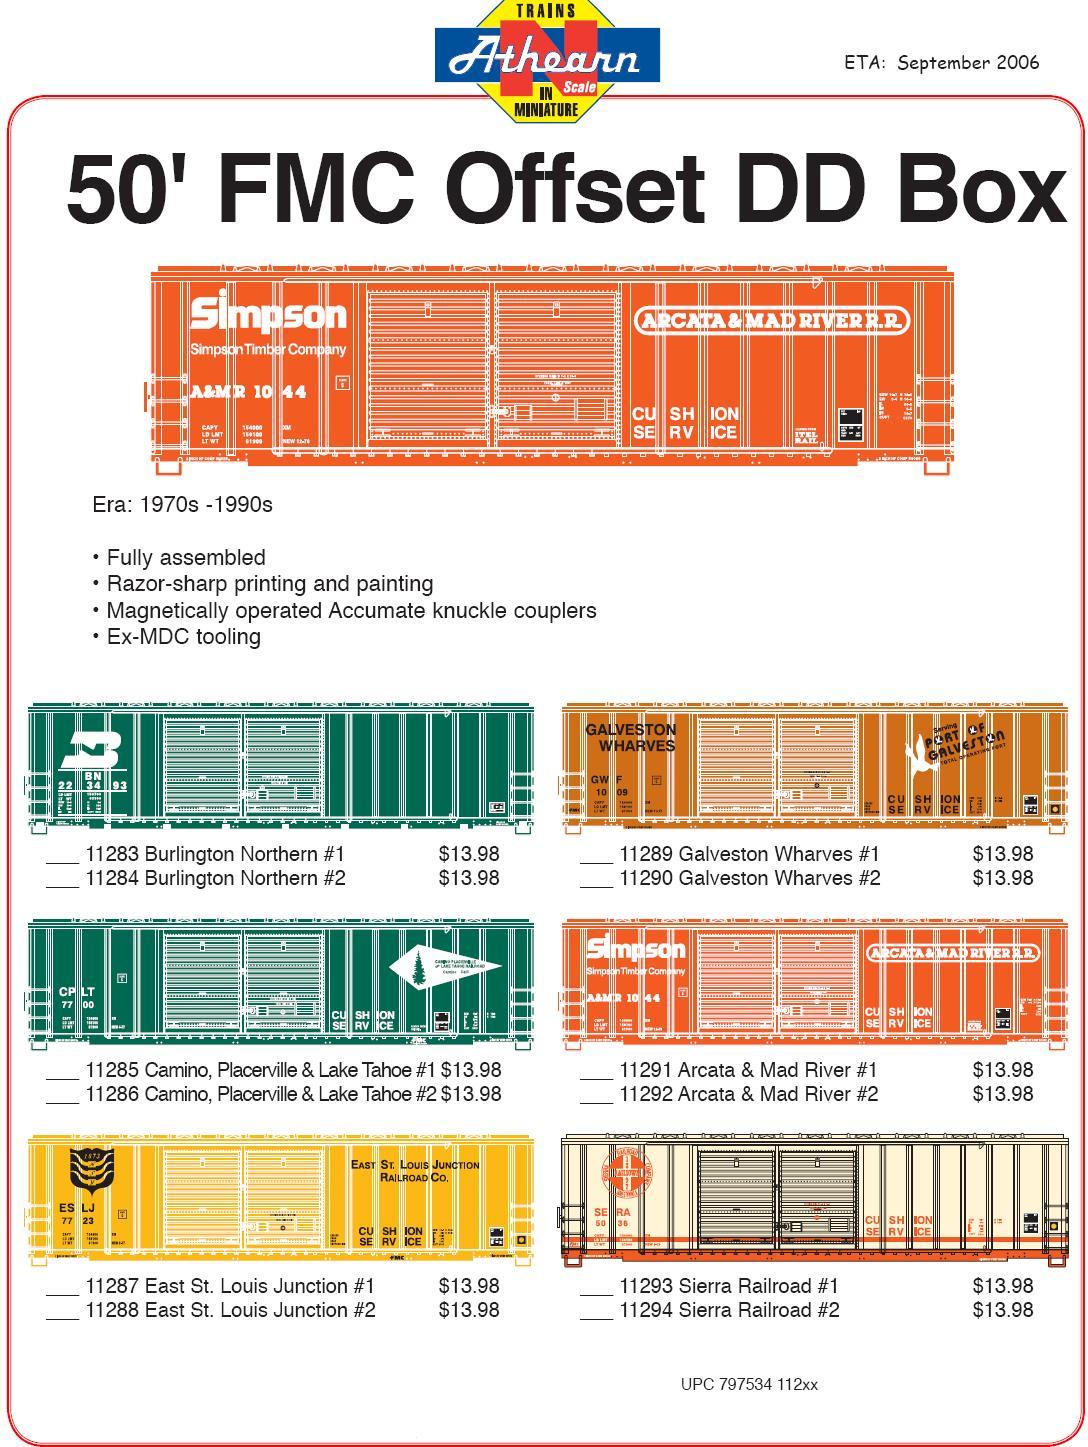 Athearn 50 FMC Offset DD Boxcar